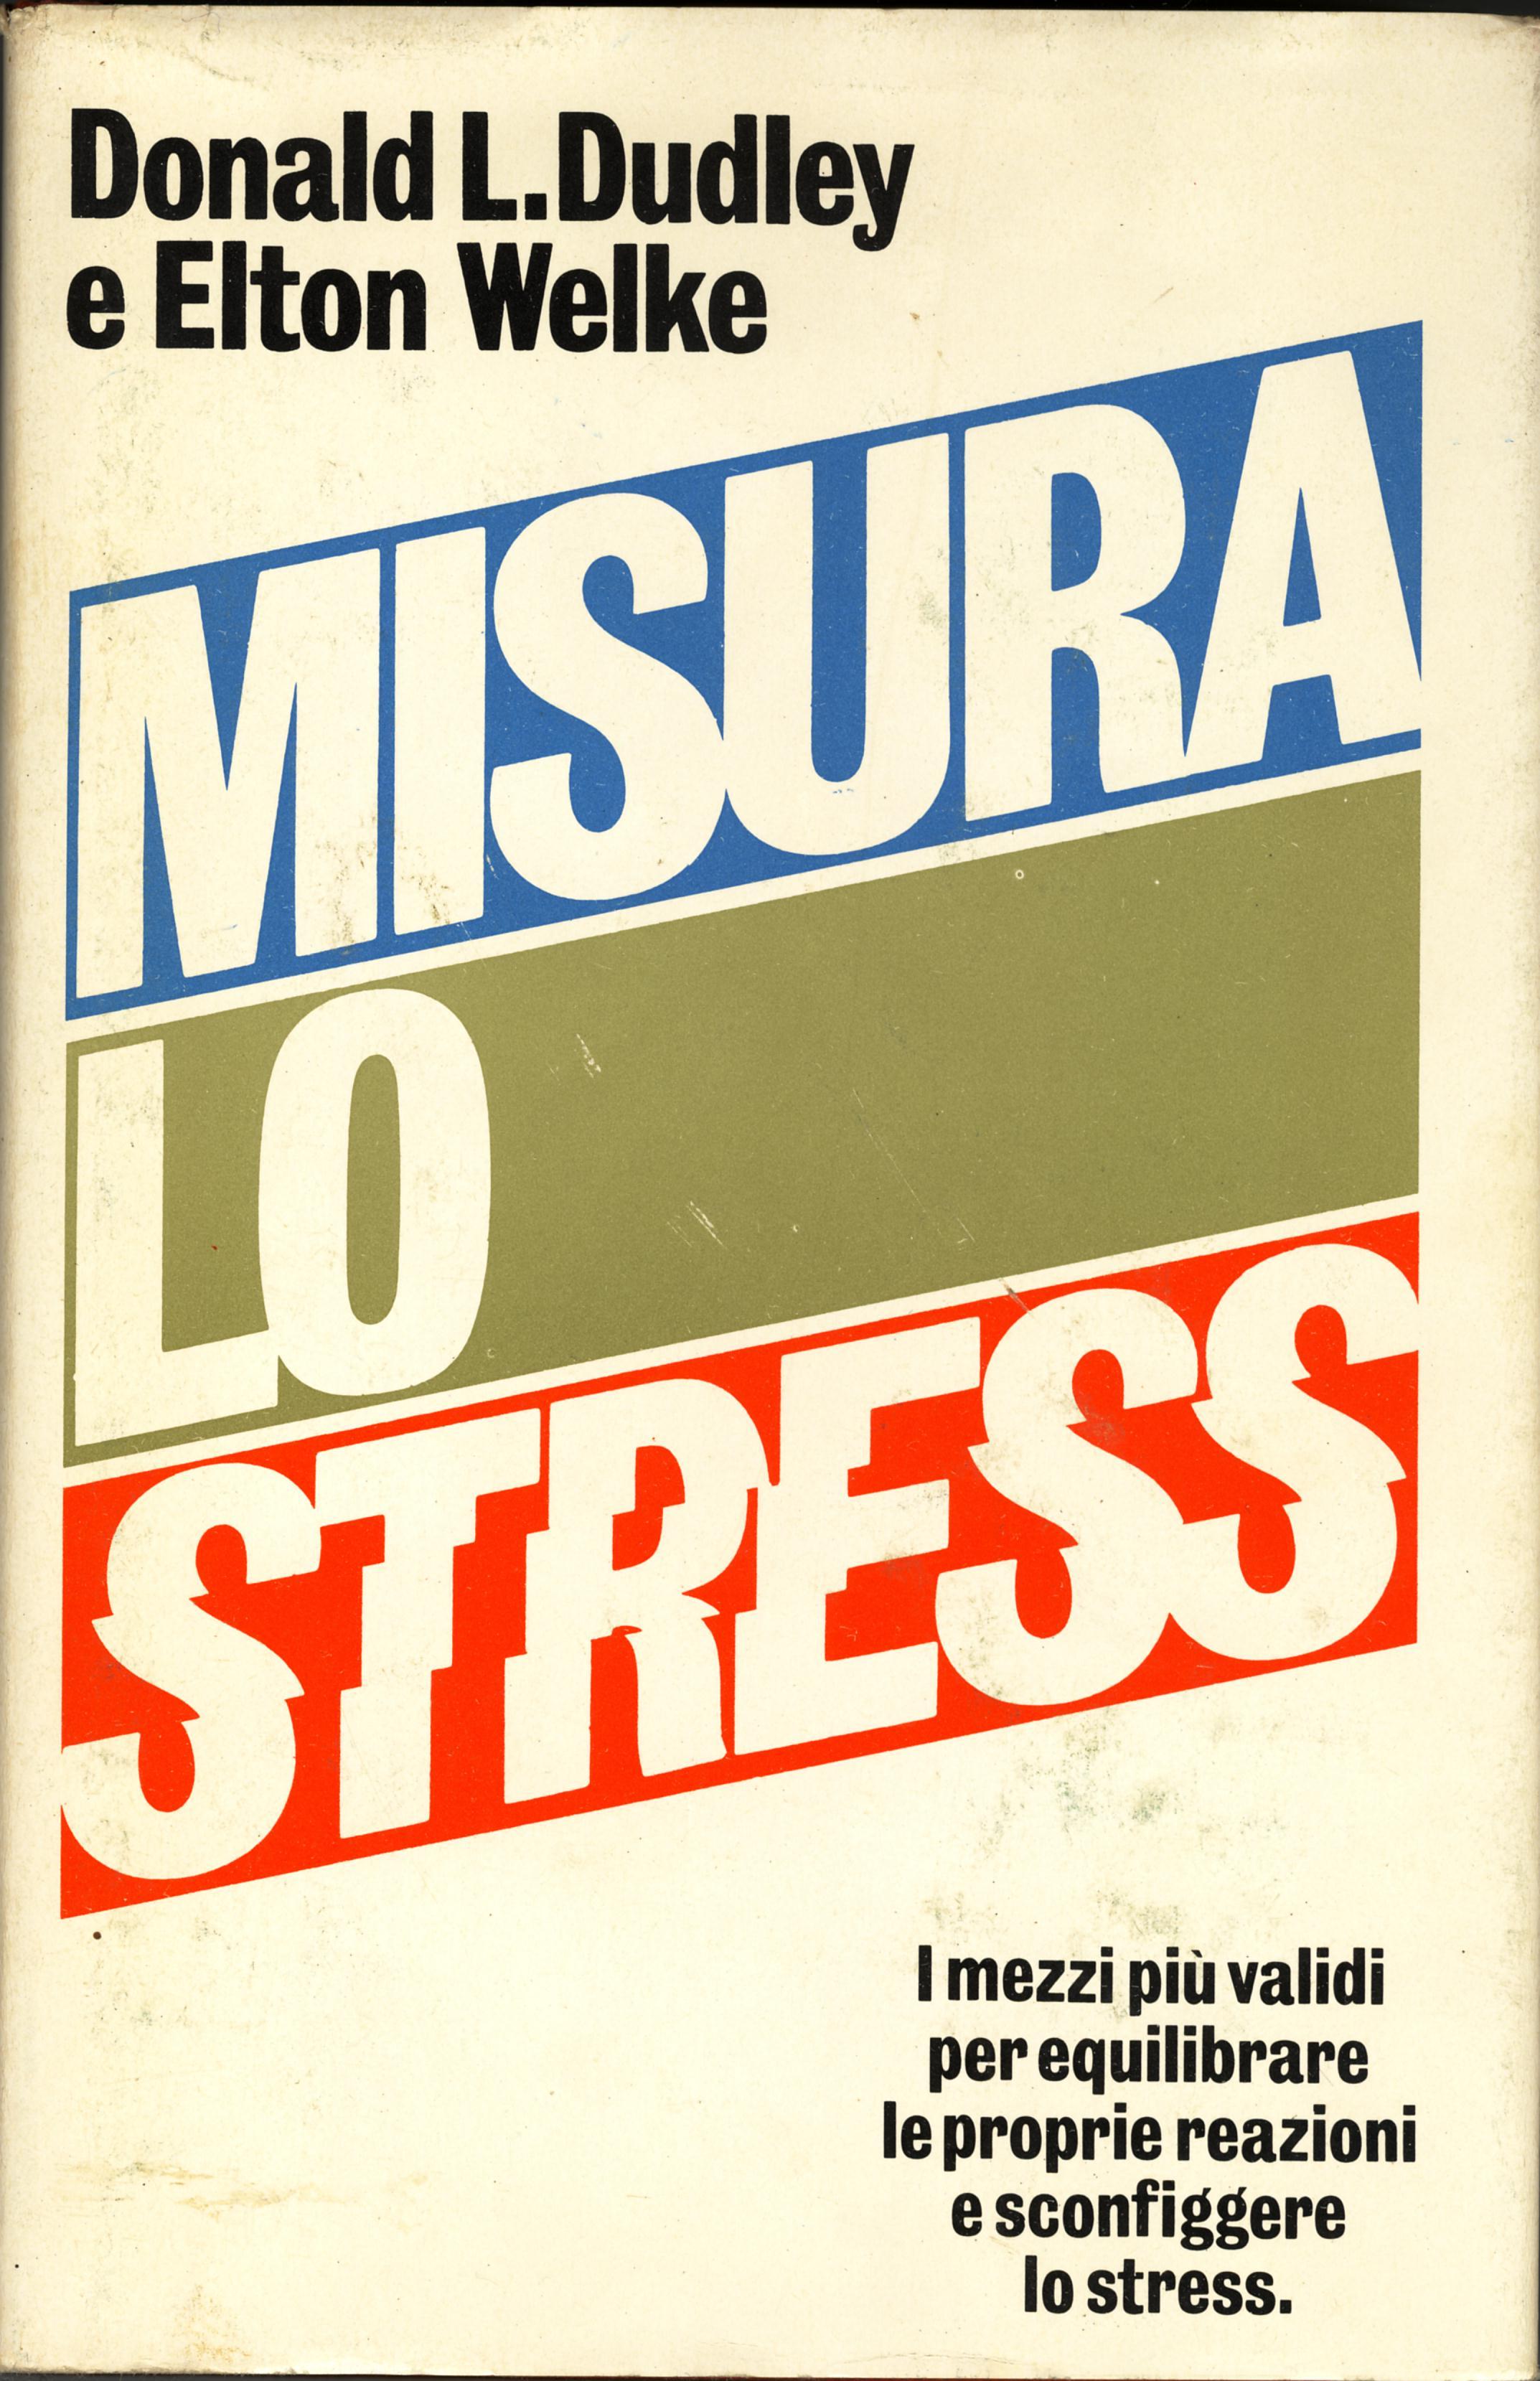 Misura lo stress